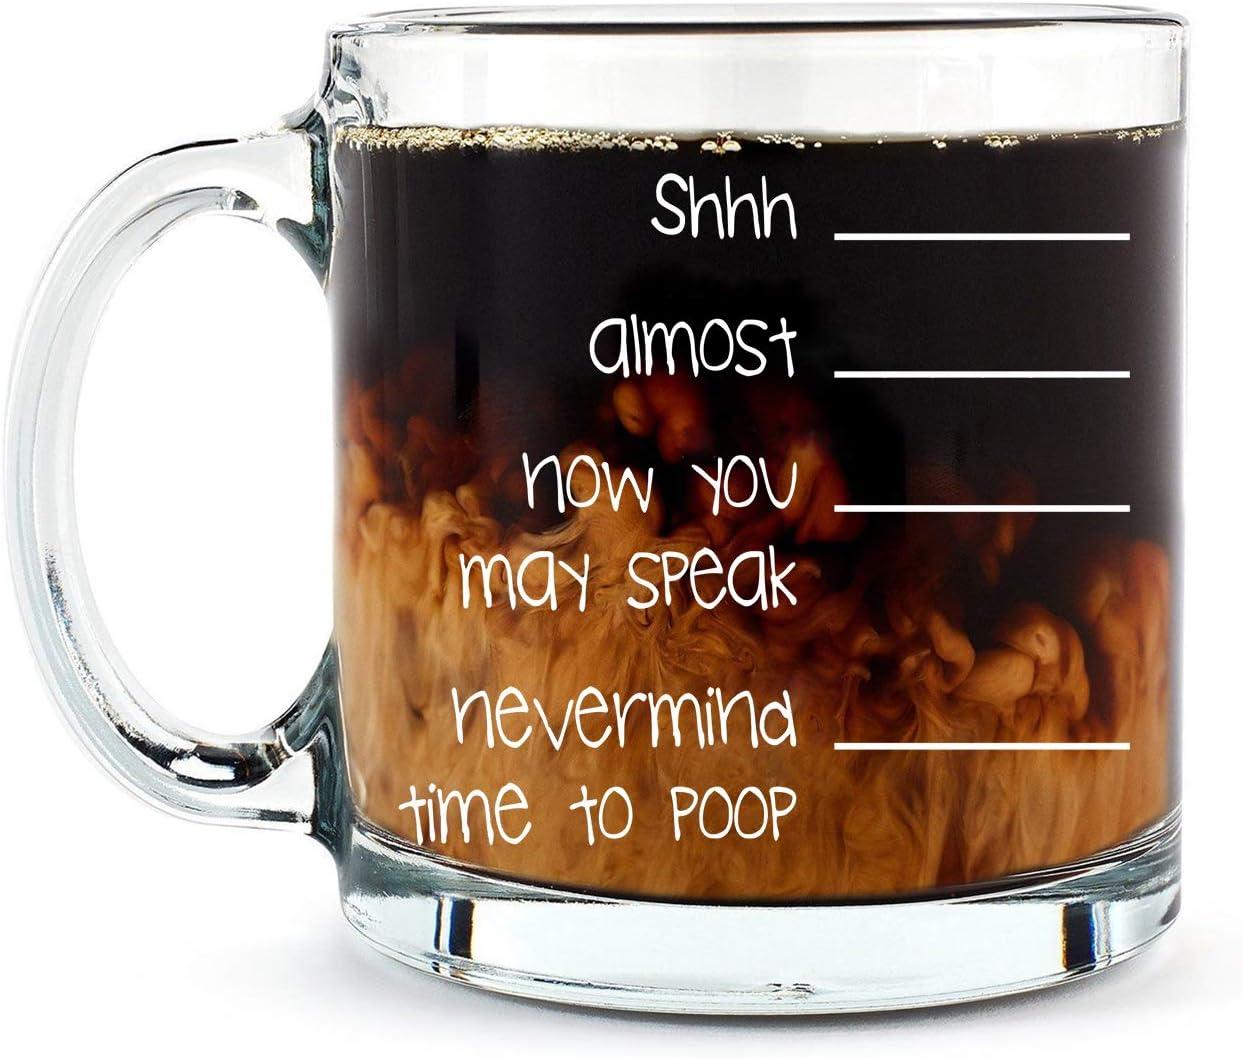 Shh. Nevermind, Time to Poop Mug - Funny Poop Mug - 13OZ Glass Coffee Mug - Mugs For Women, Boss, Friend, Employee, or Spouse - Perfect Birthday Idea - By AW Fashions